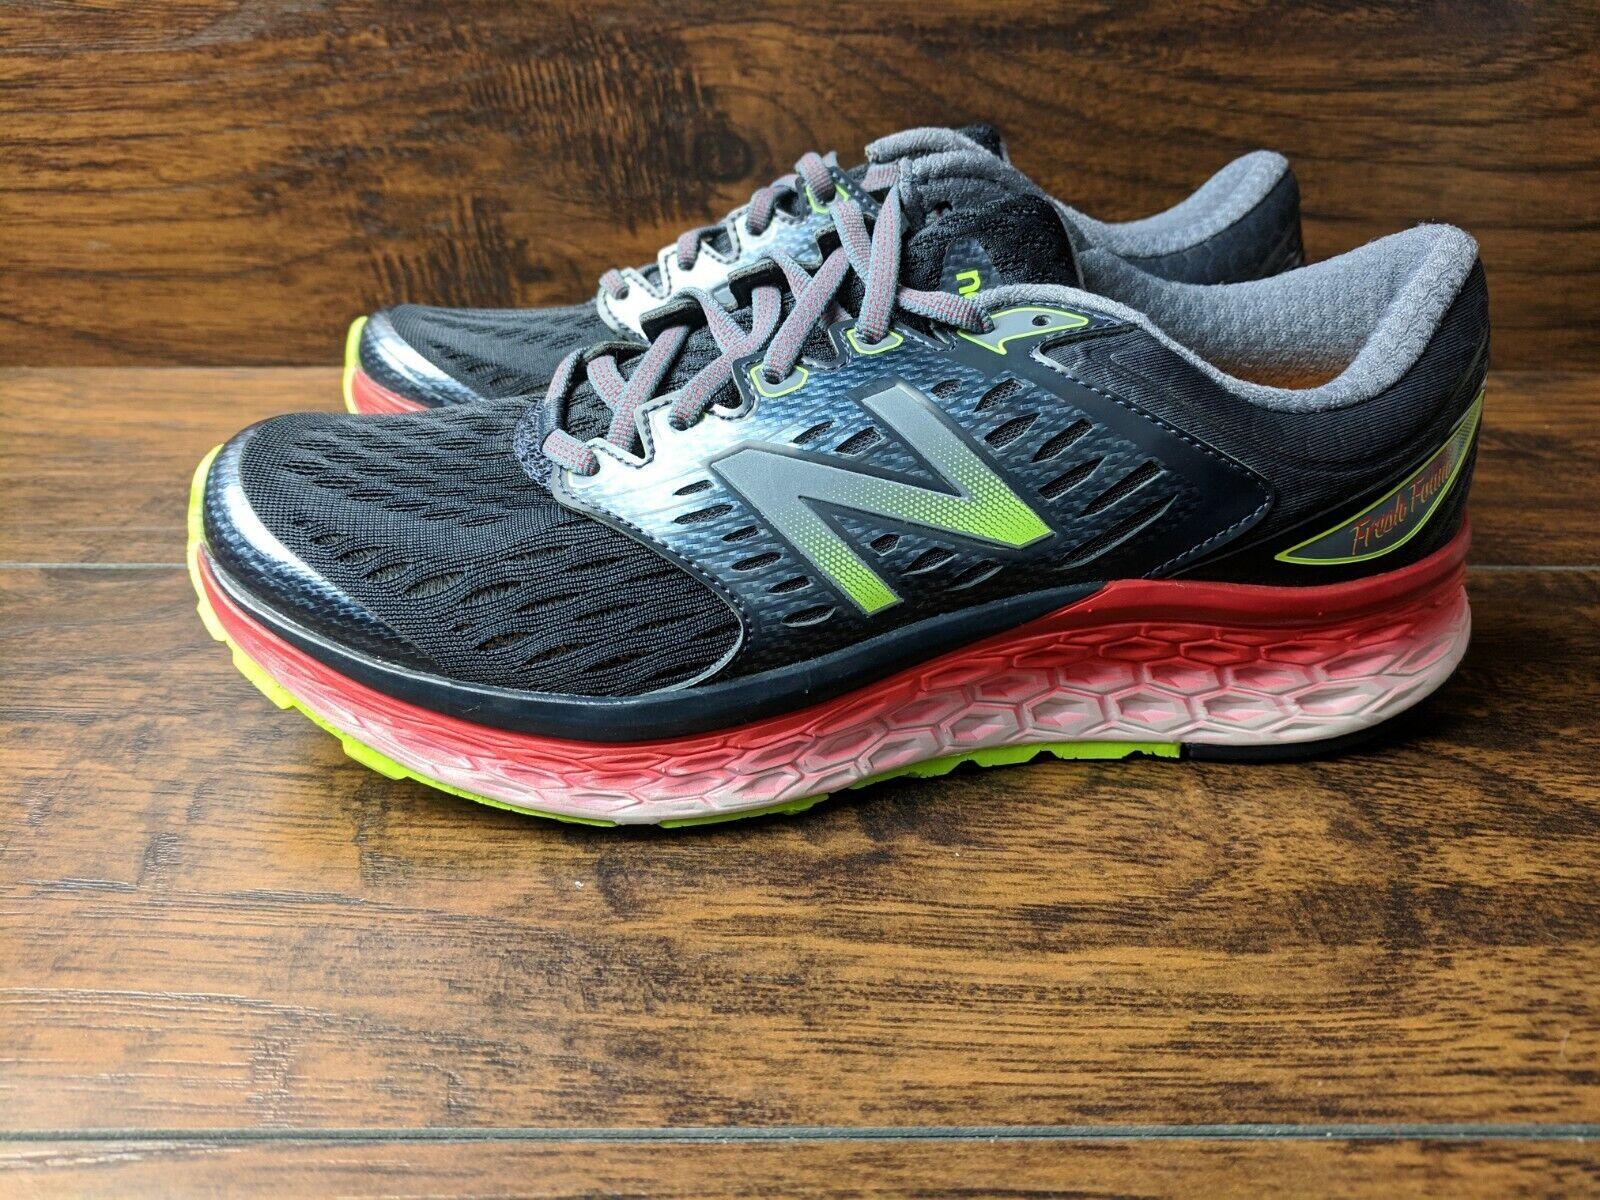 Marca nueva espuma Fresco New Balance M1080BK6 para hombres talla 9 calzado para correr